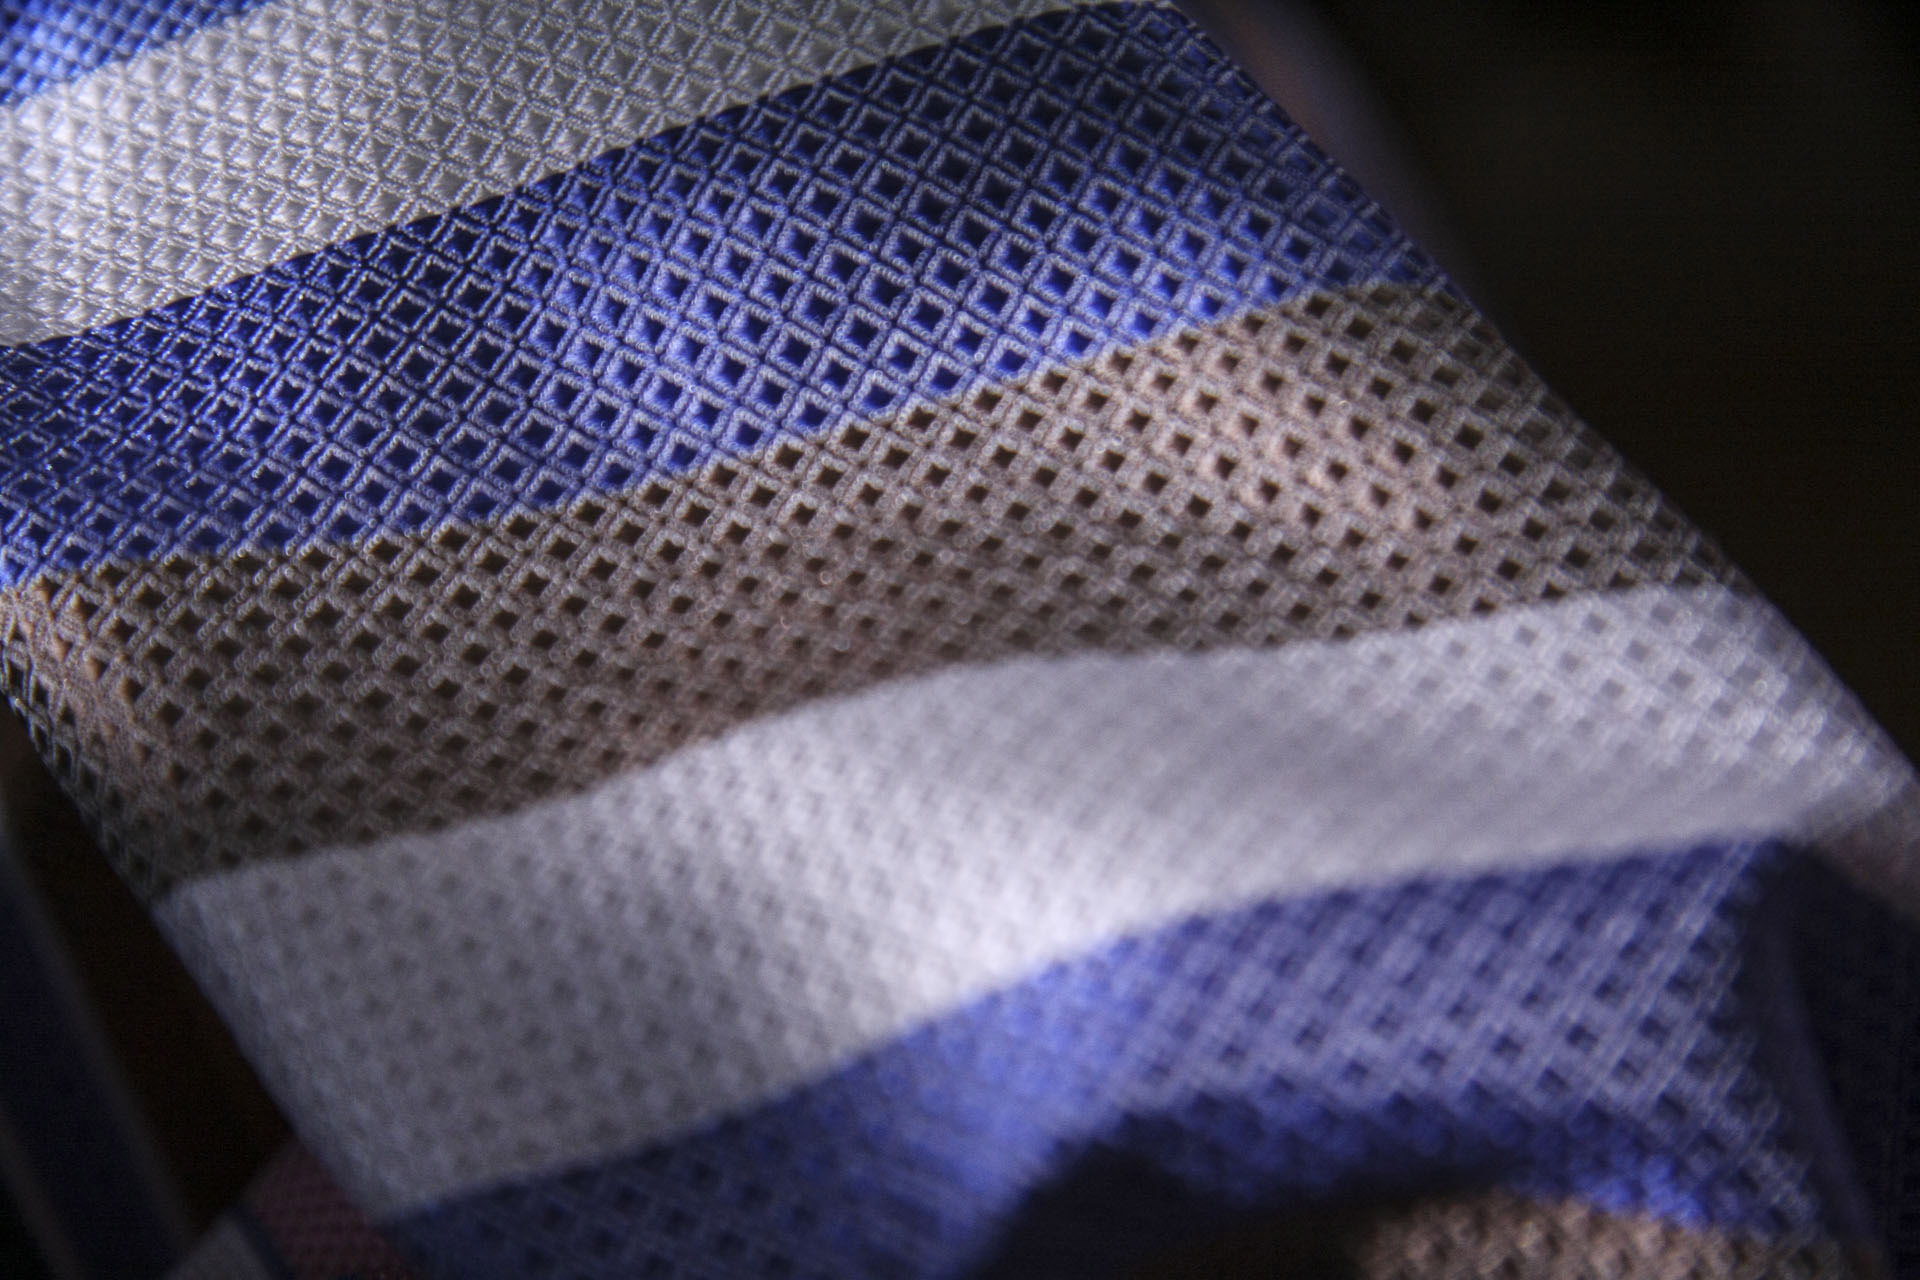 Cccompany cravatteria cravatte tessuti jacquard collezioni - Tessuti fiorati ...